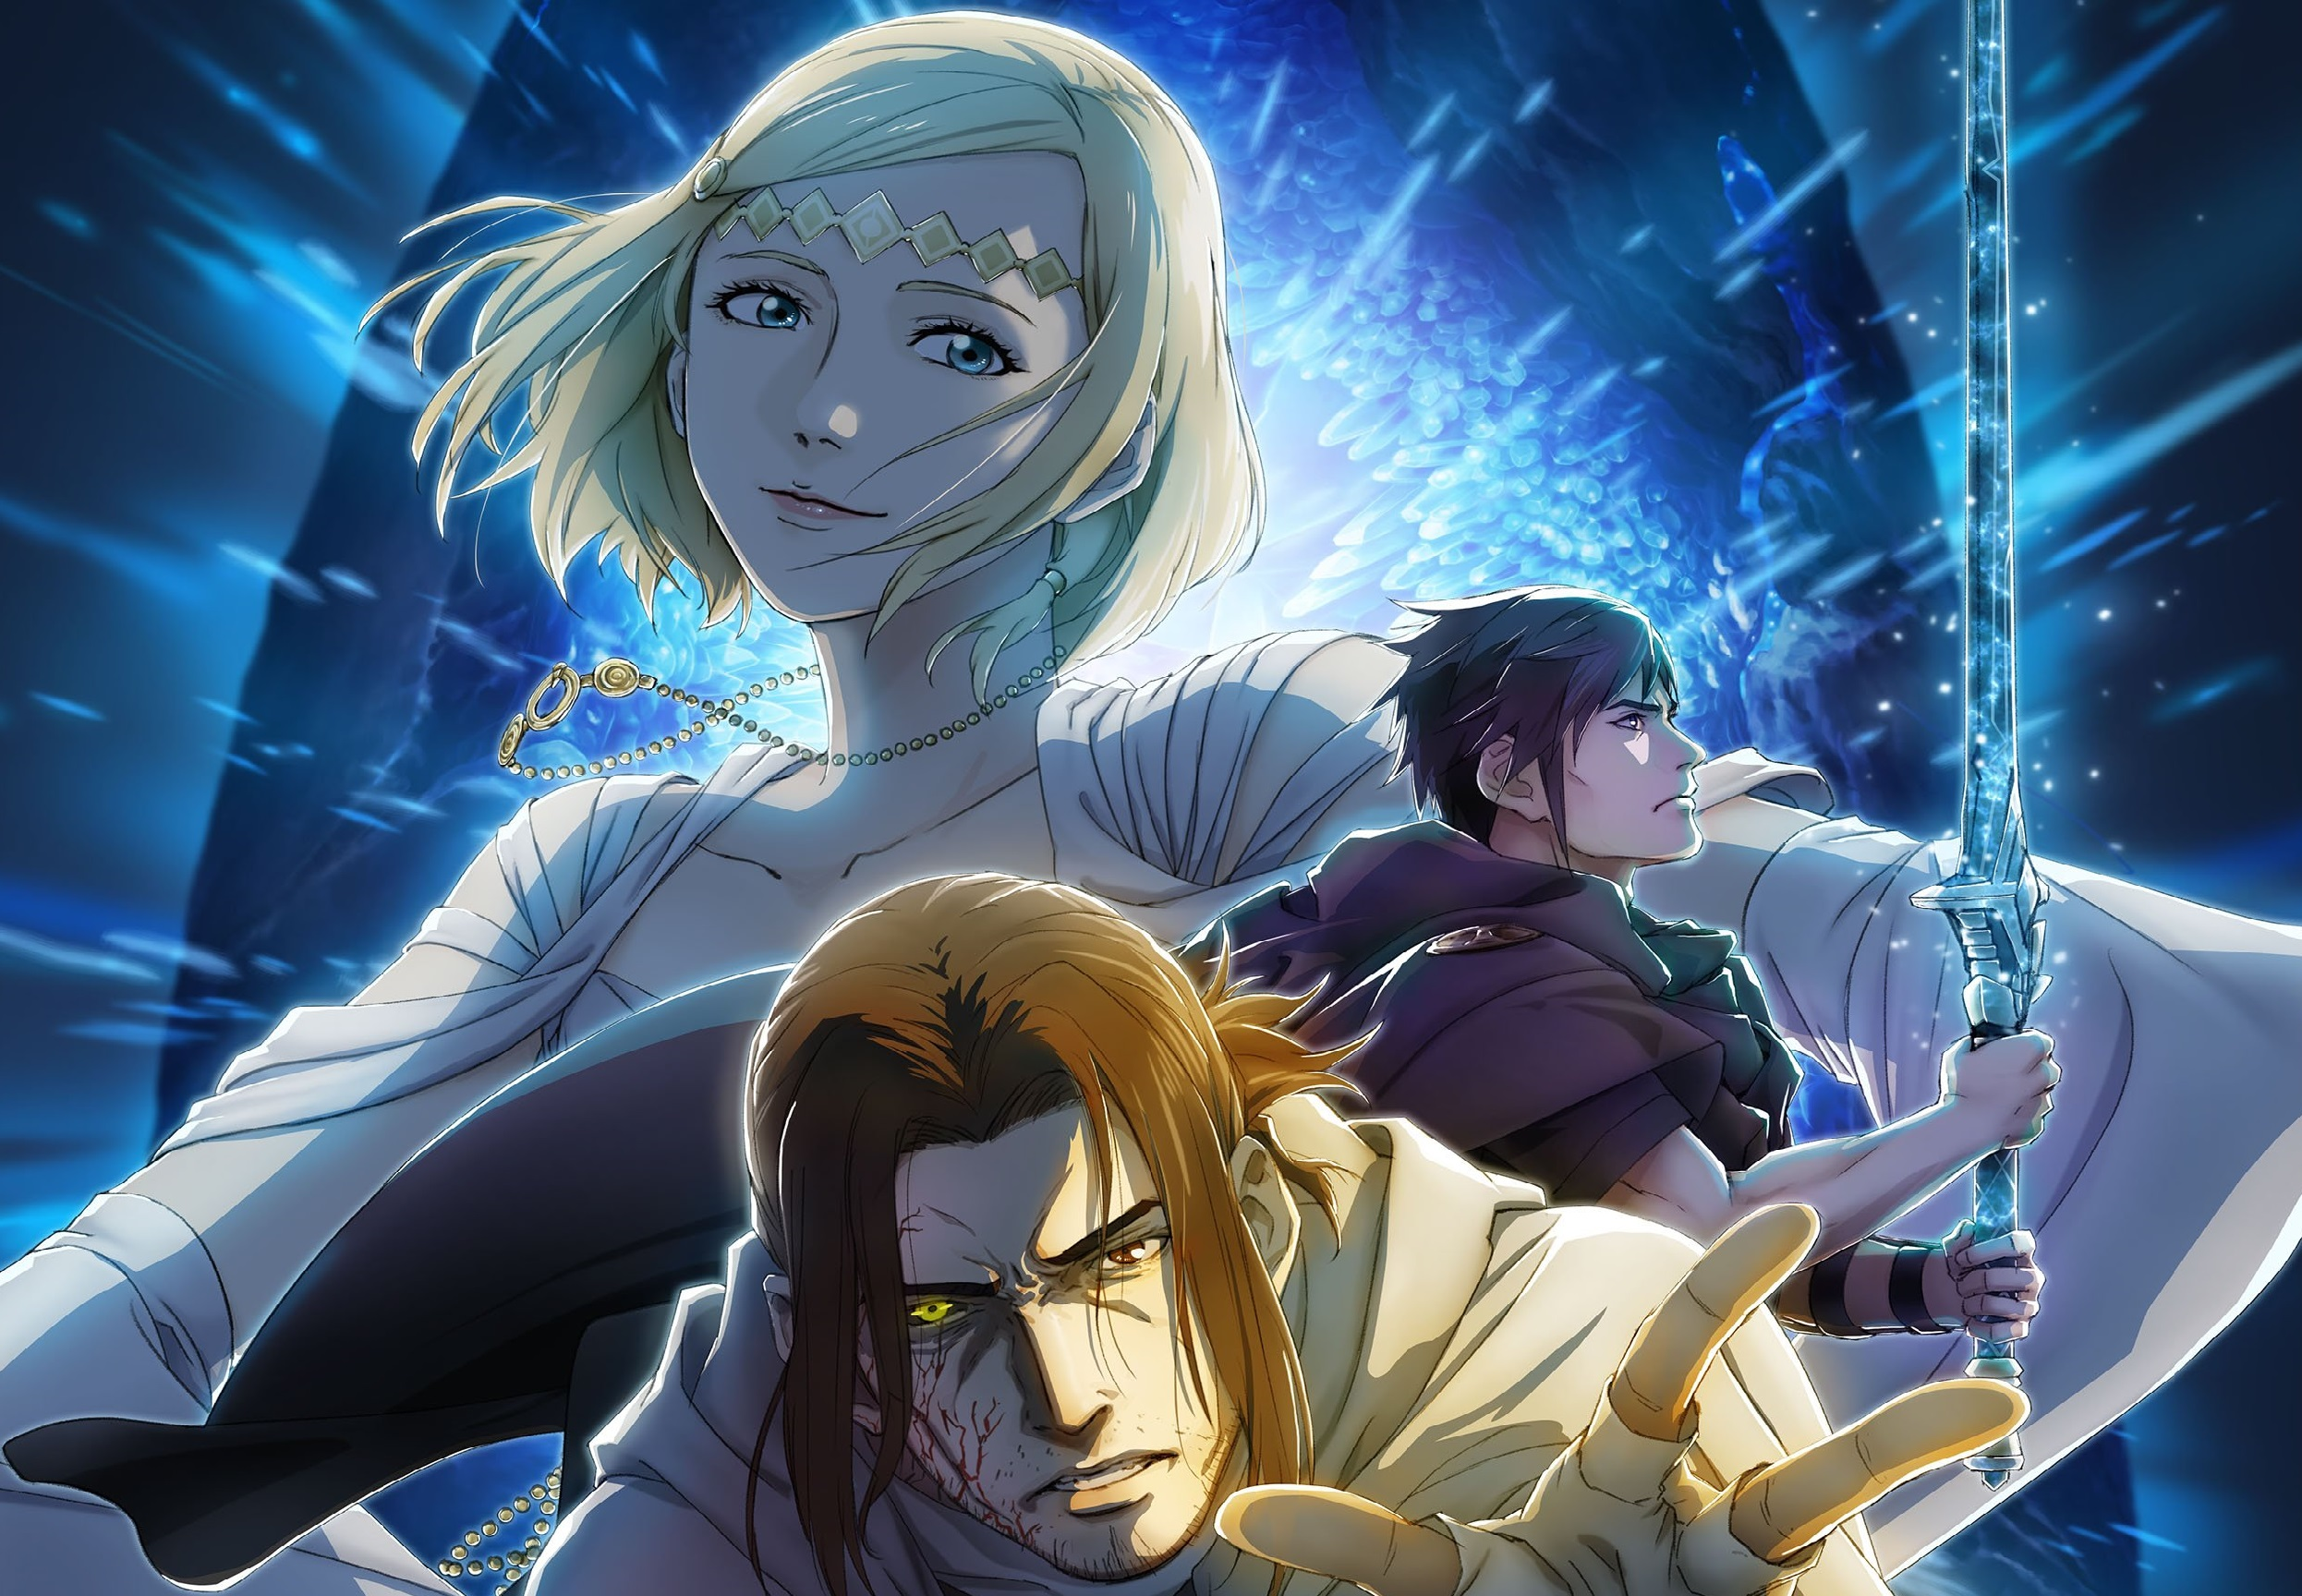 Final Fantasy Xv Episode Ardyn Prologue Anime Gets Key Art